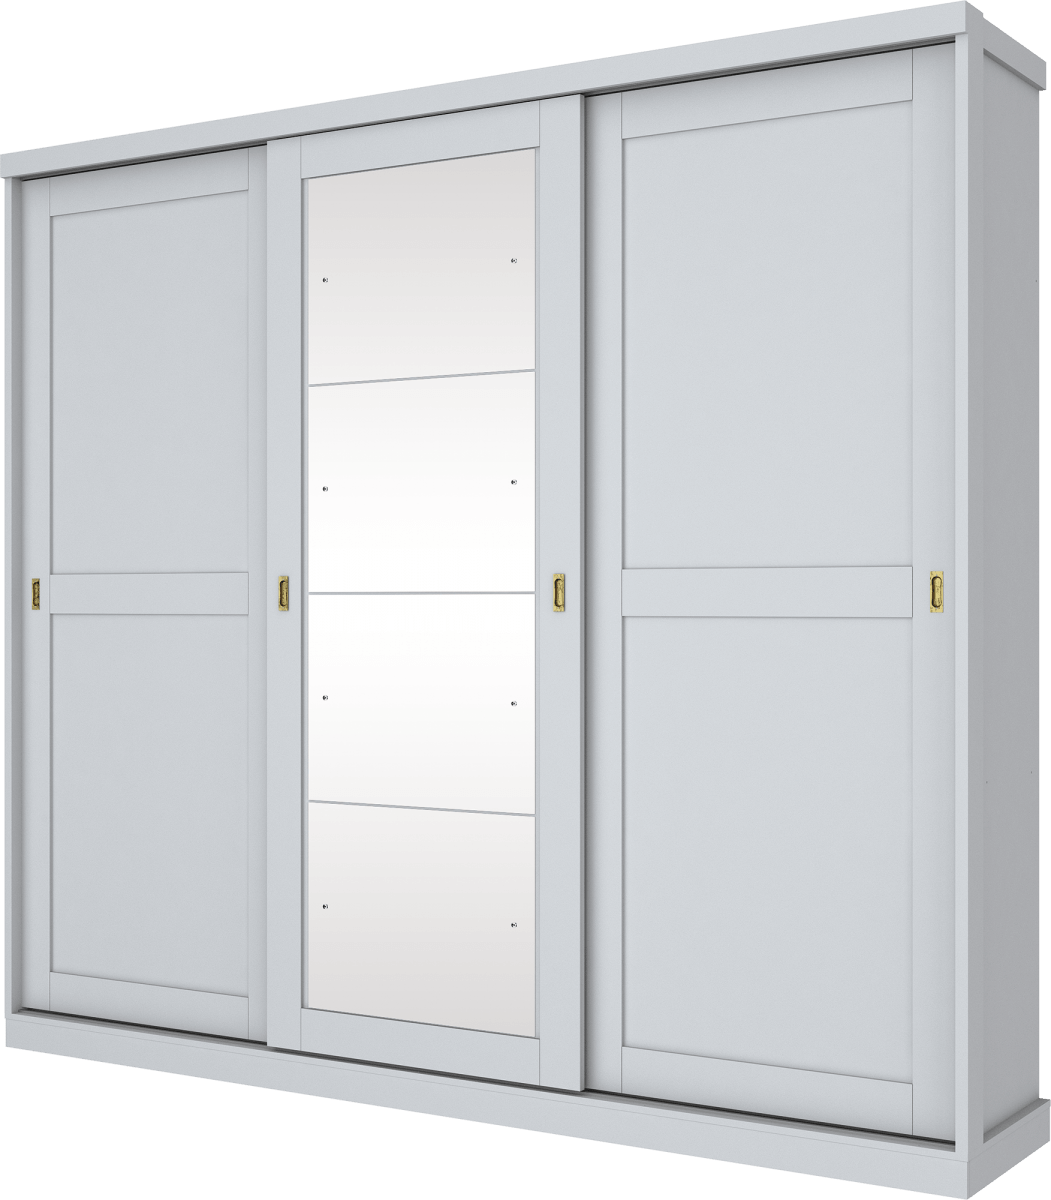 Guarda Roupa Olympia Henn 03 Portas com Espelho Deslizantes Branco Hp D223-05 BRANCO HP D22305BRANCOHP